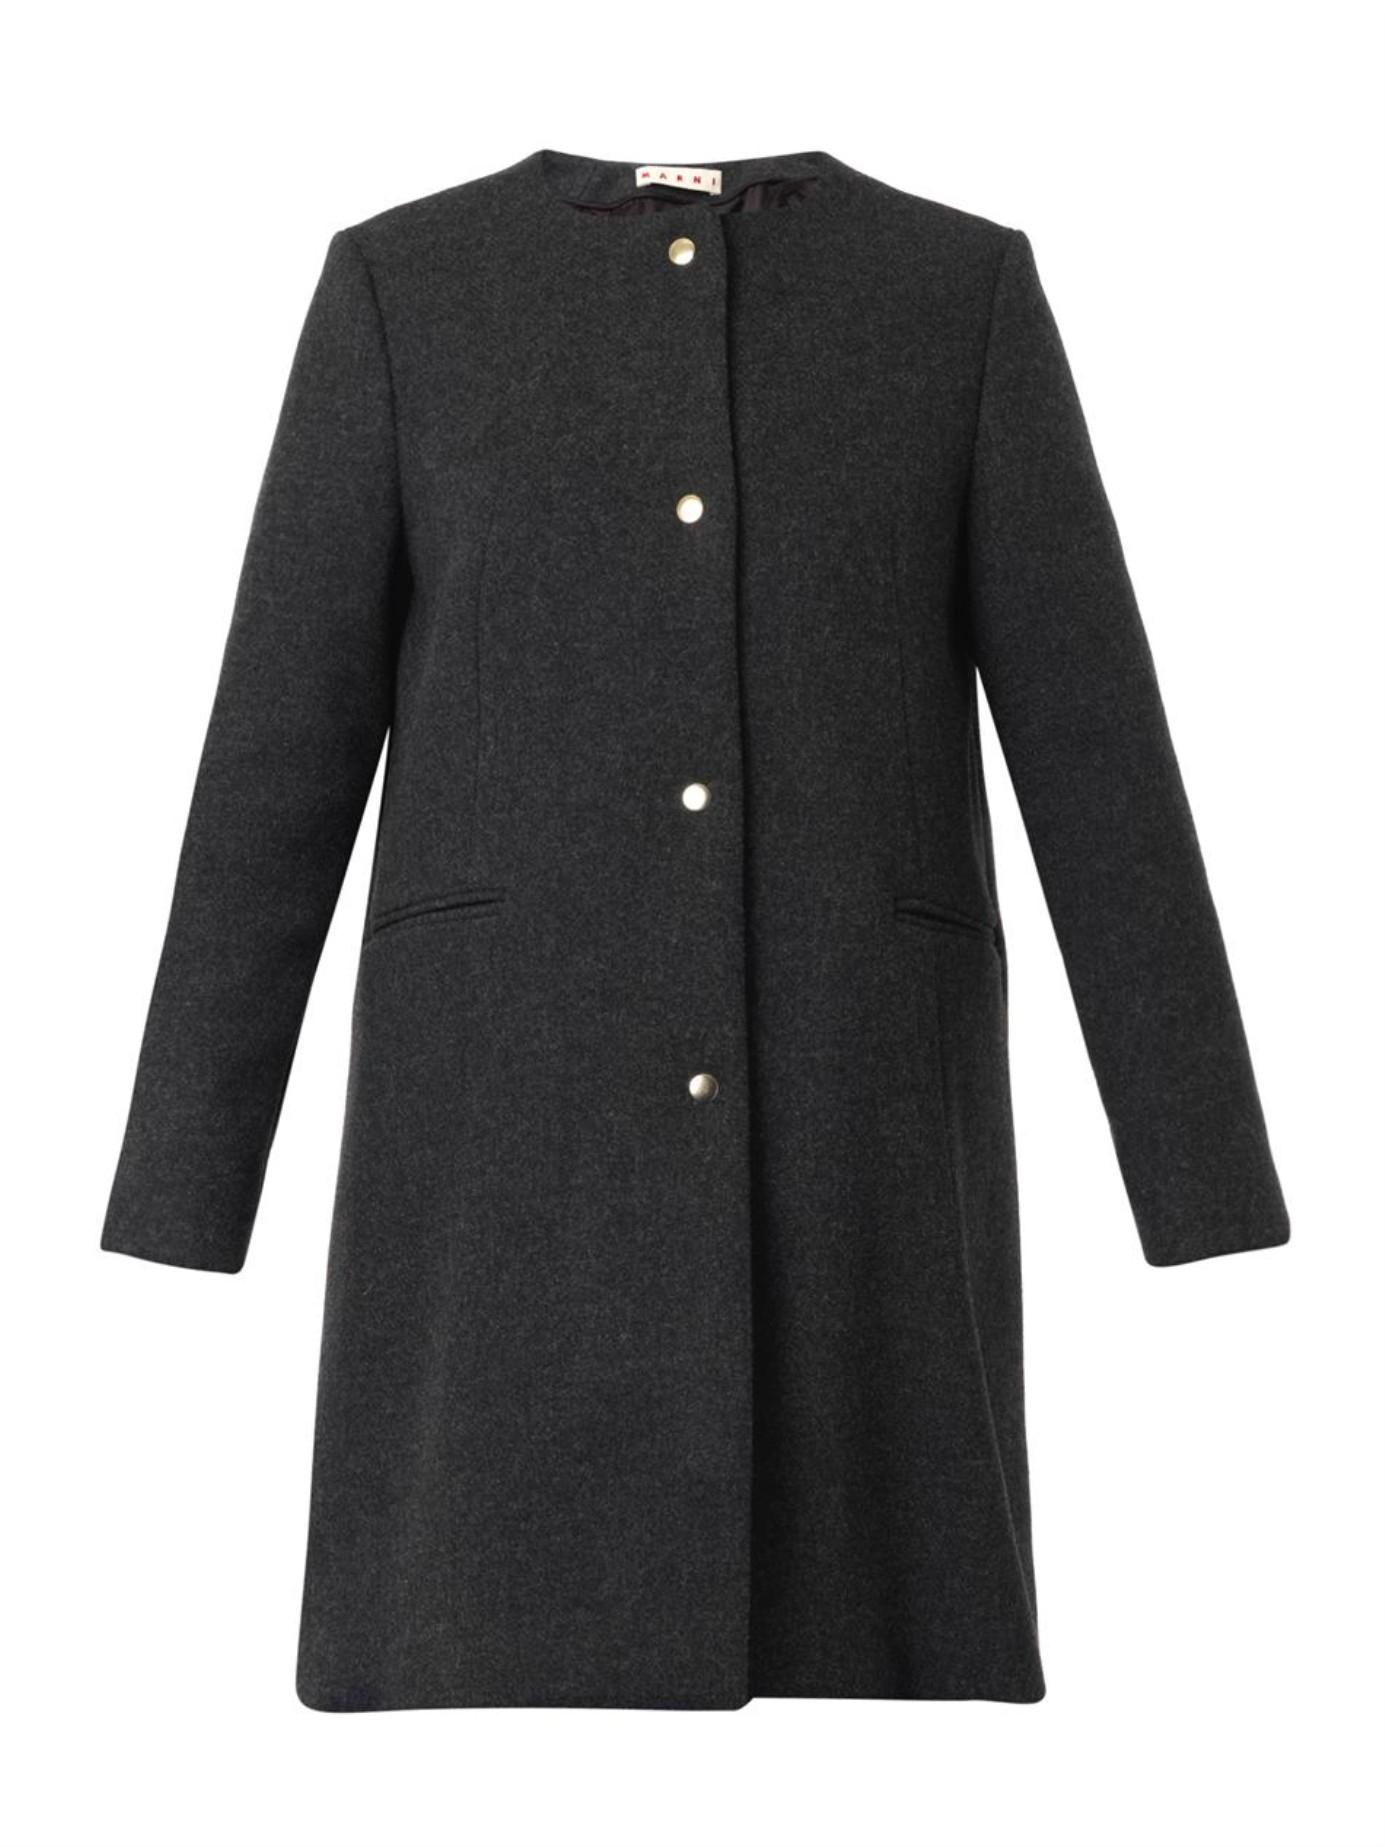 Marni Collarless Wool-Blend Coat in Gray | Lyst